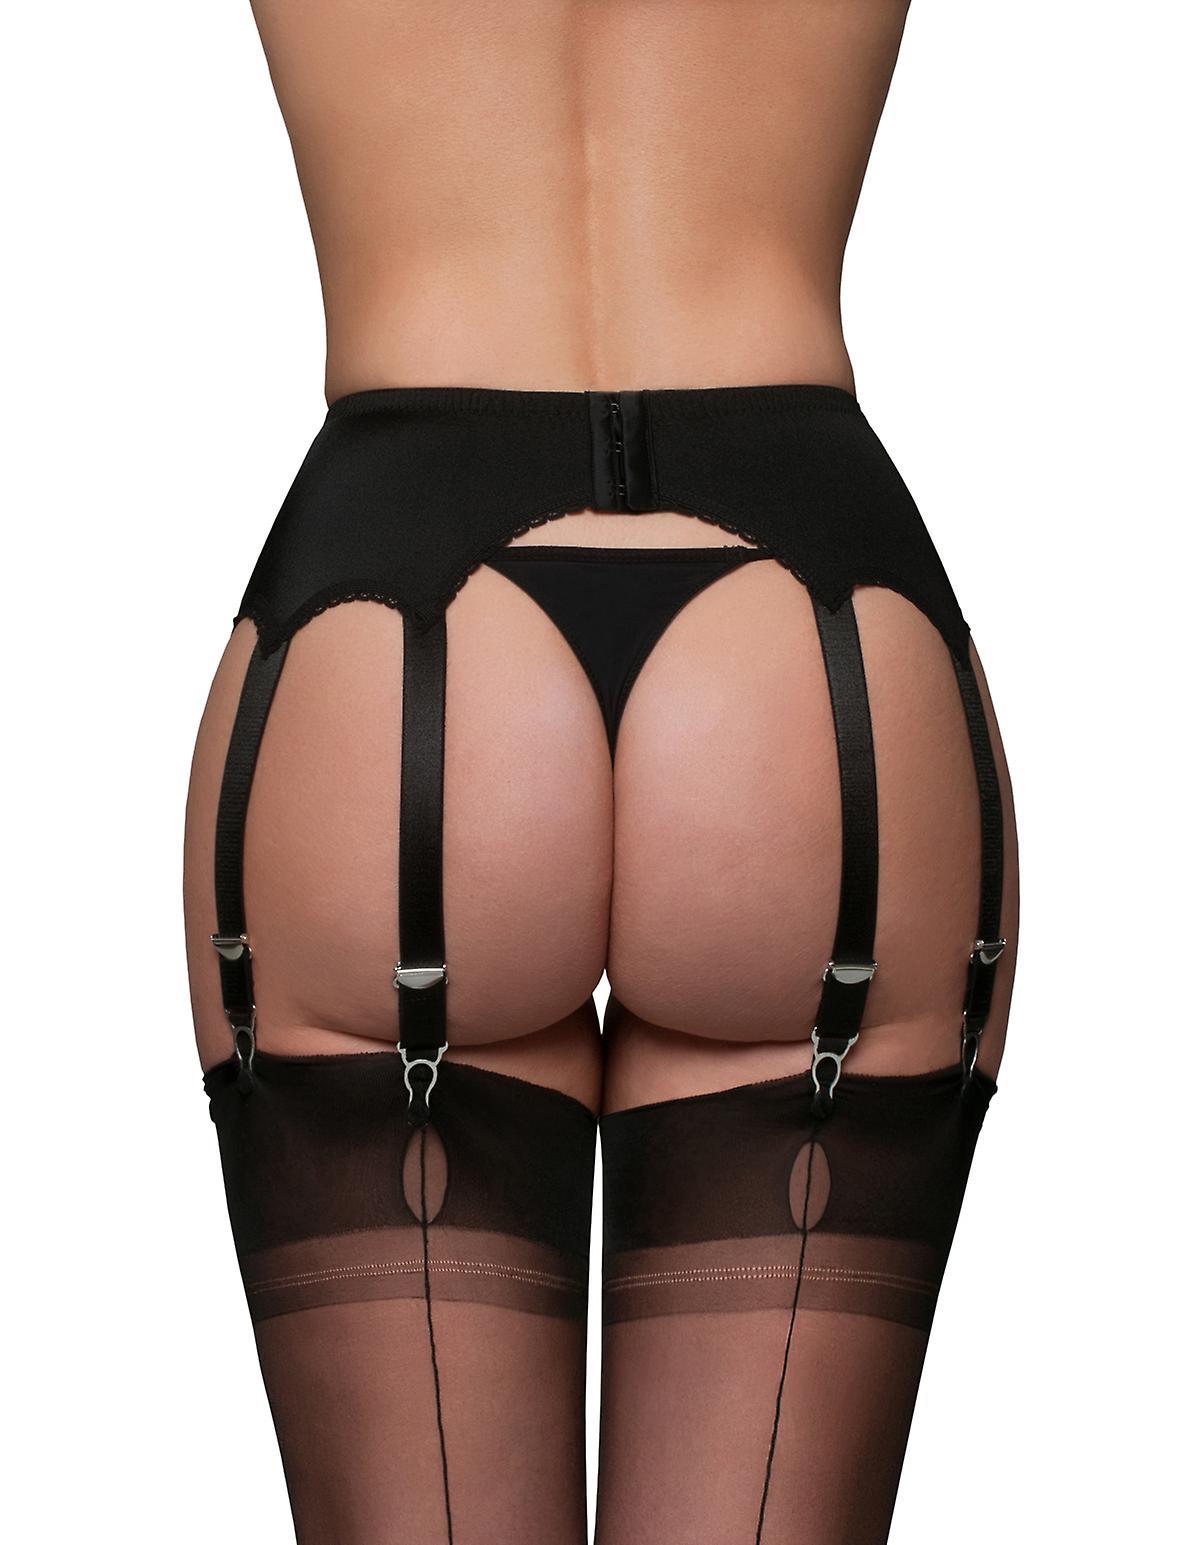 Nylon Dreams NDL10 Women's Garter Belt 10 Strap Suspender Belt